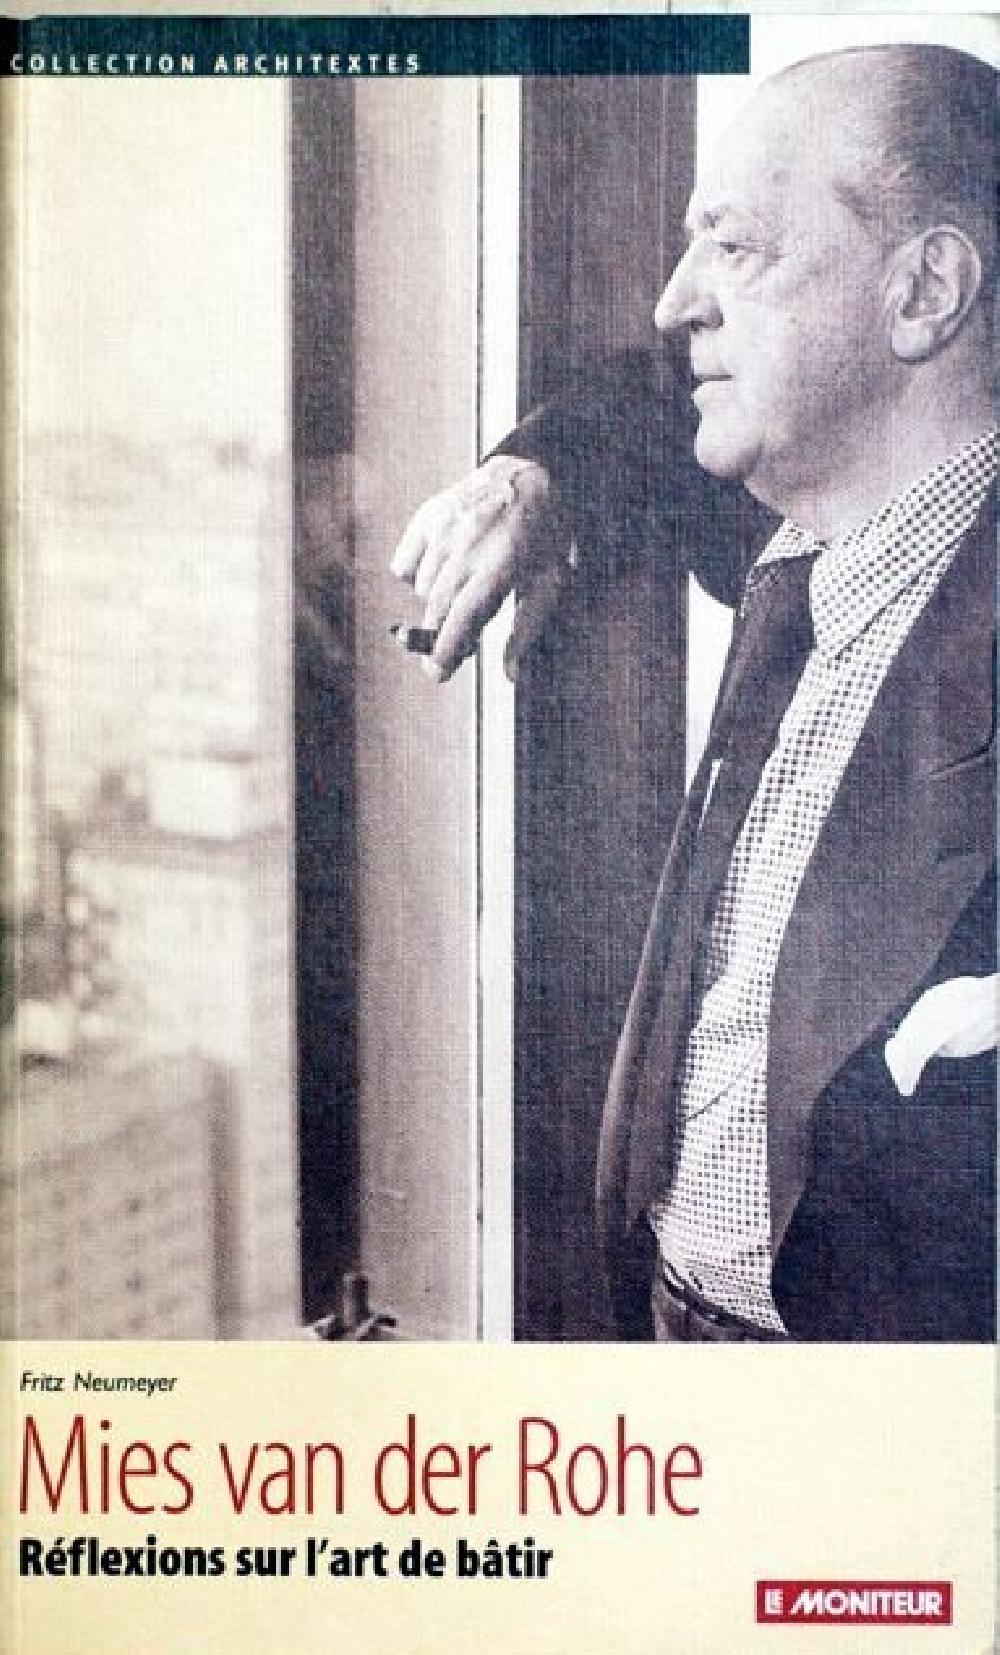 Mies van der Rohe. Réflexions sur l'art de bâtir